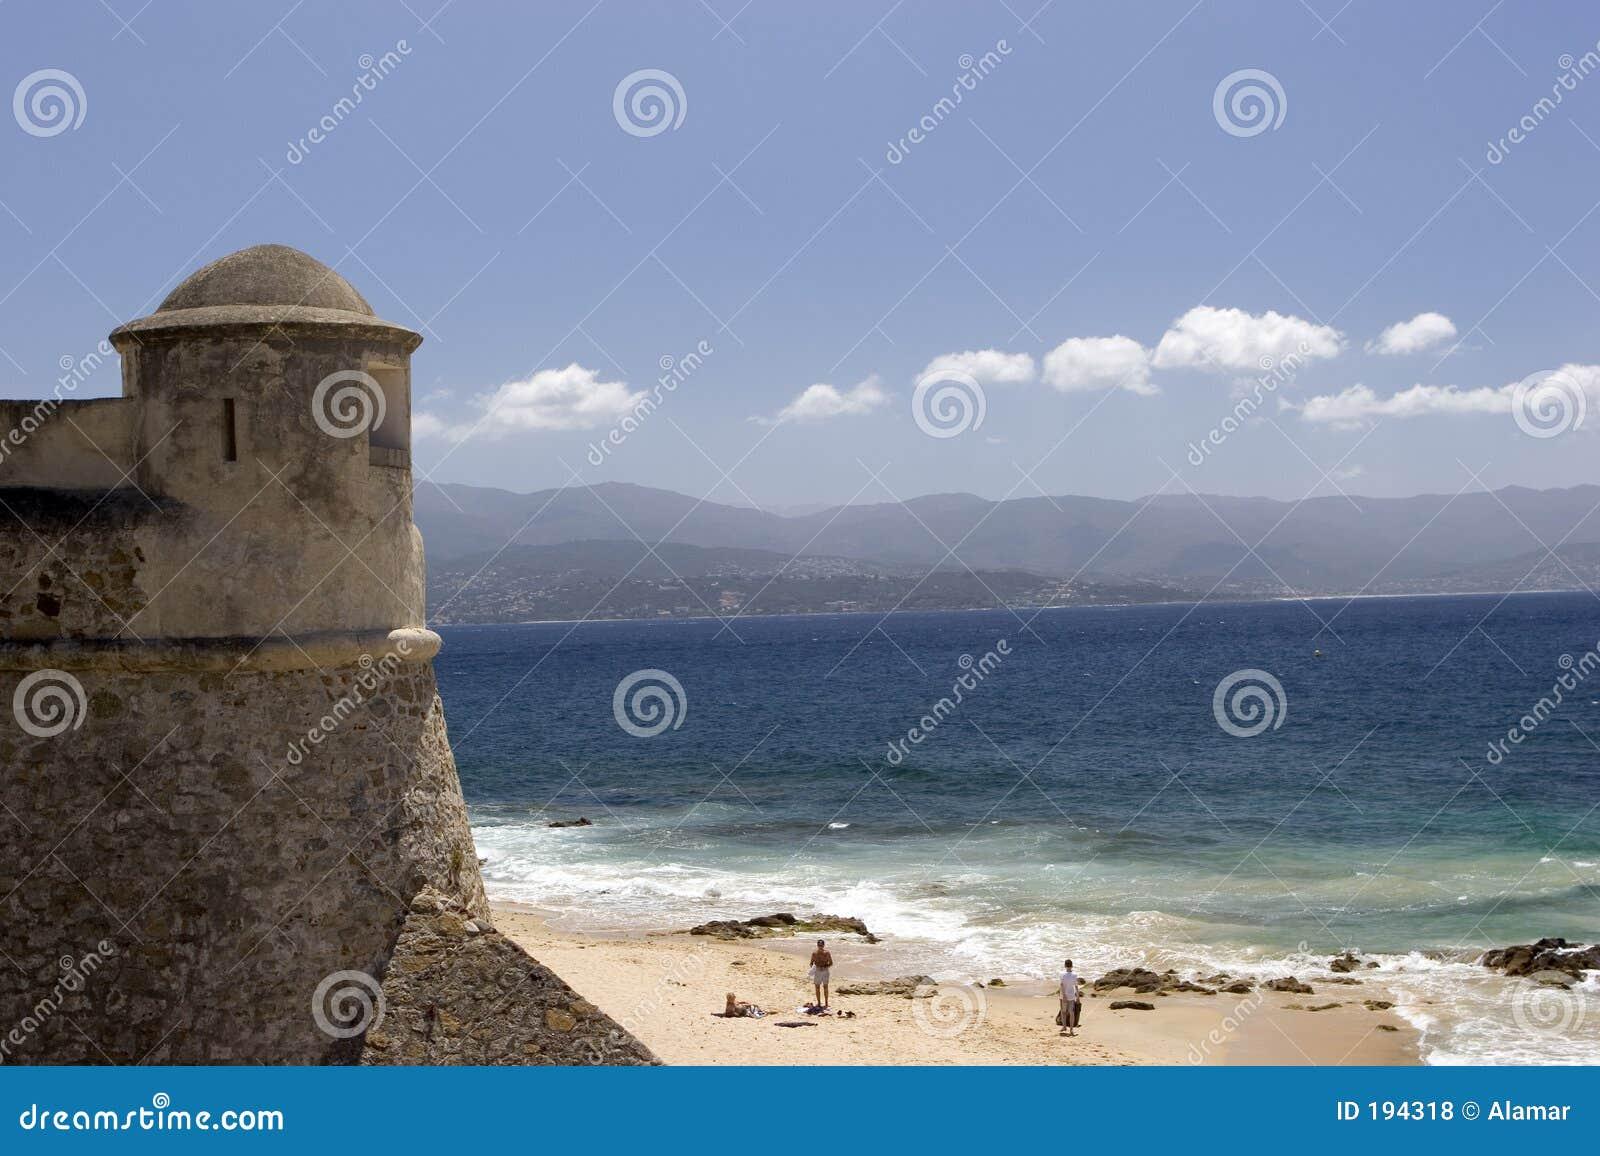 Torre e praia